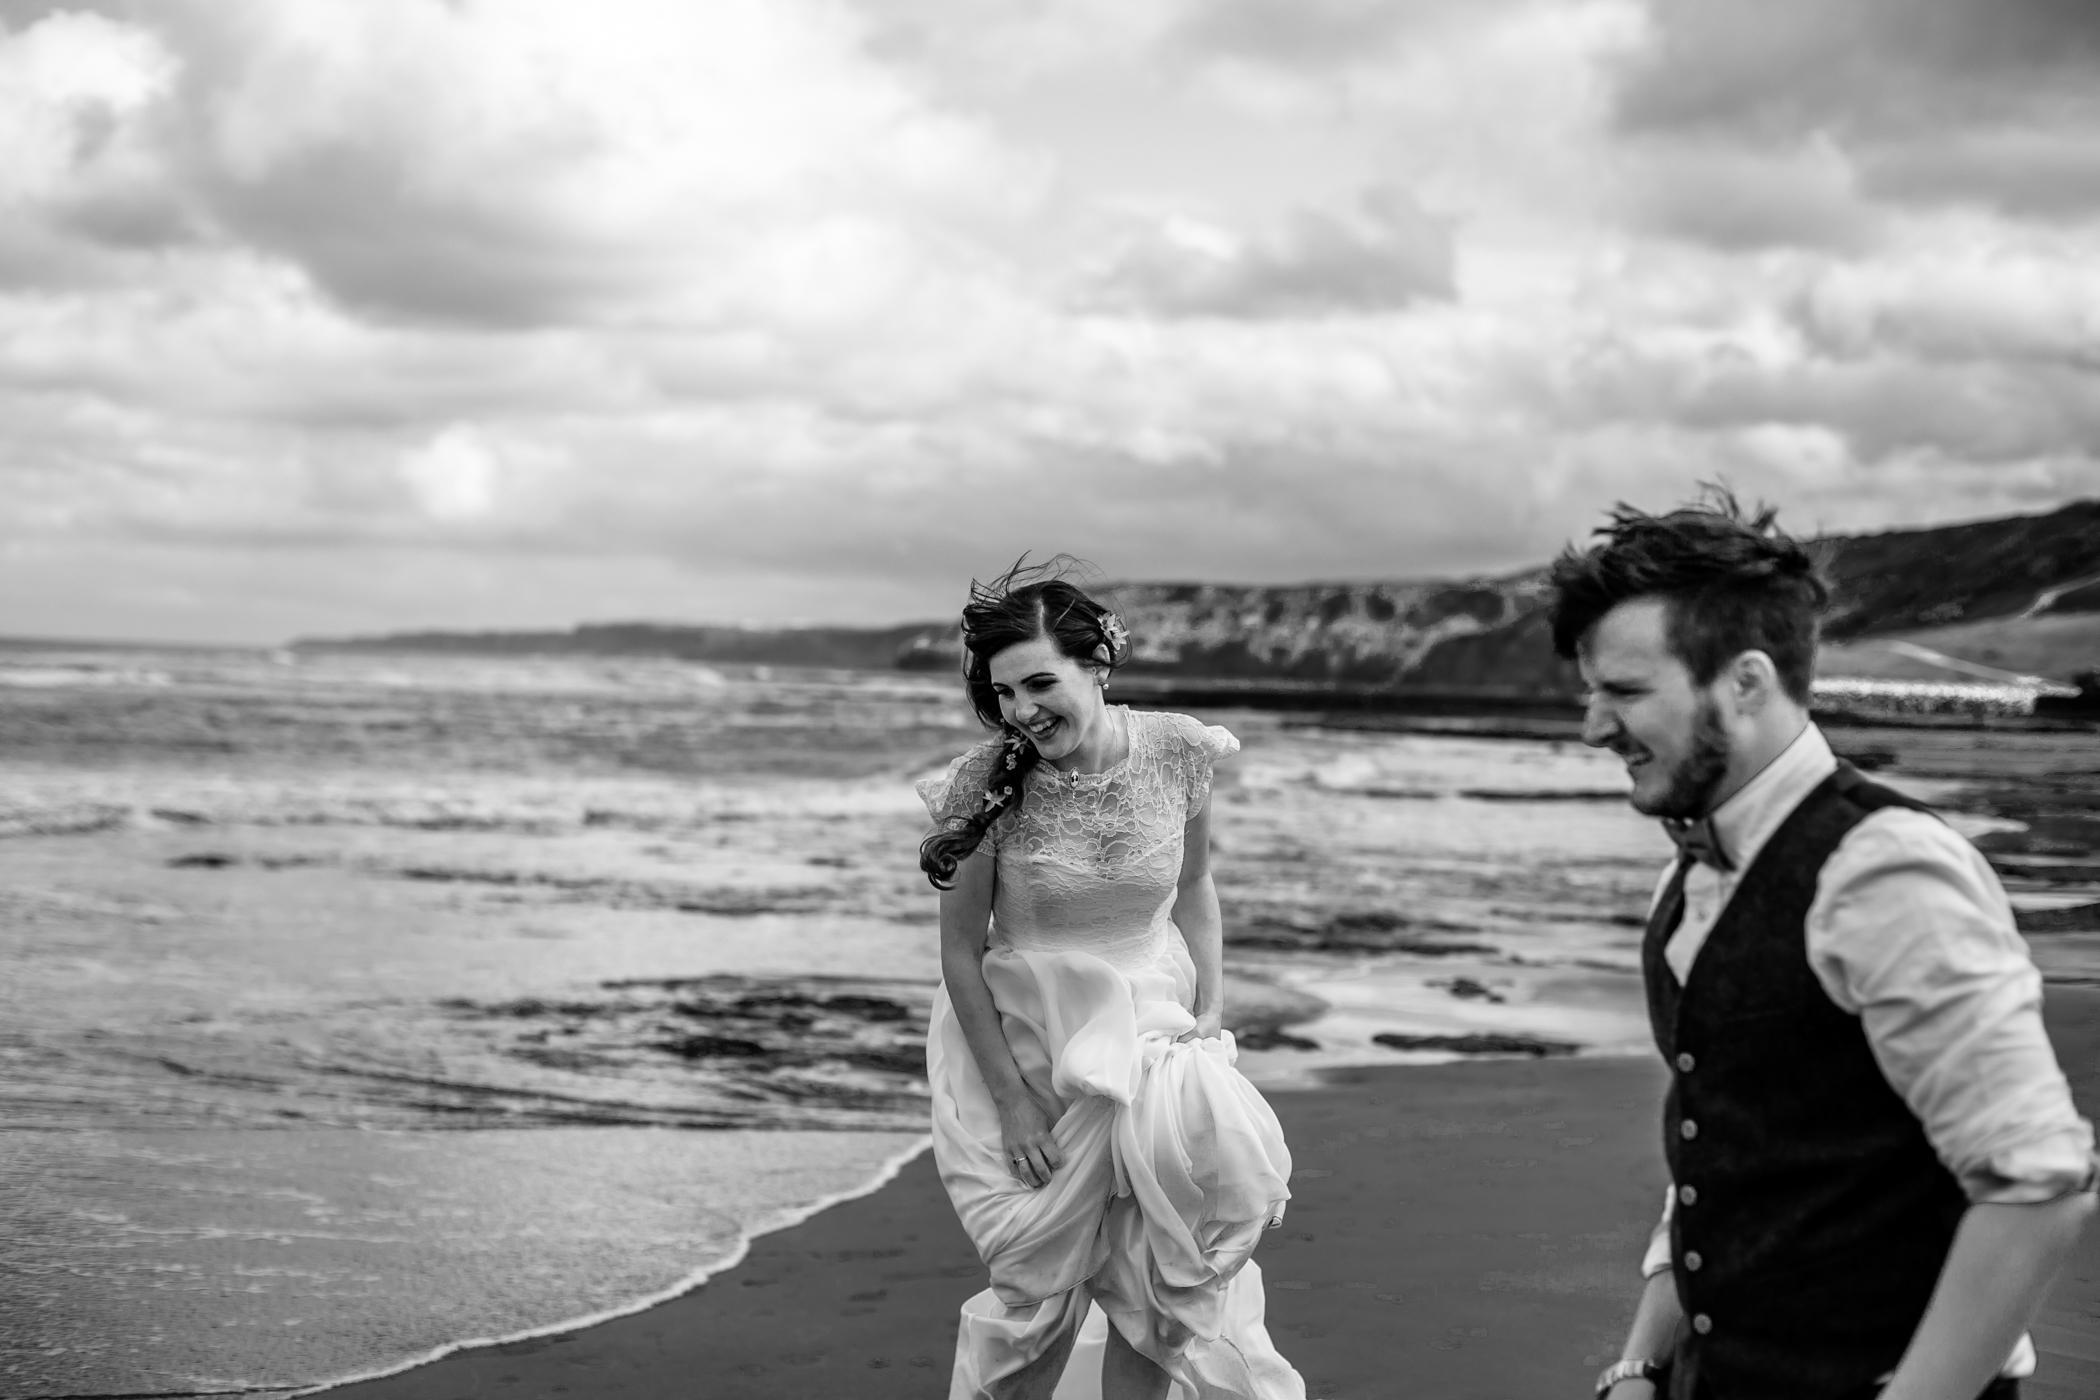 sansom photography beach wedding photography charlotte & mike-33